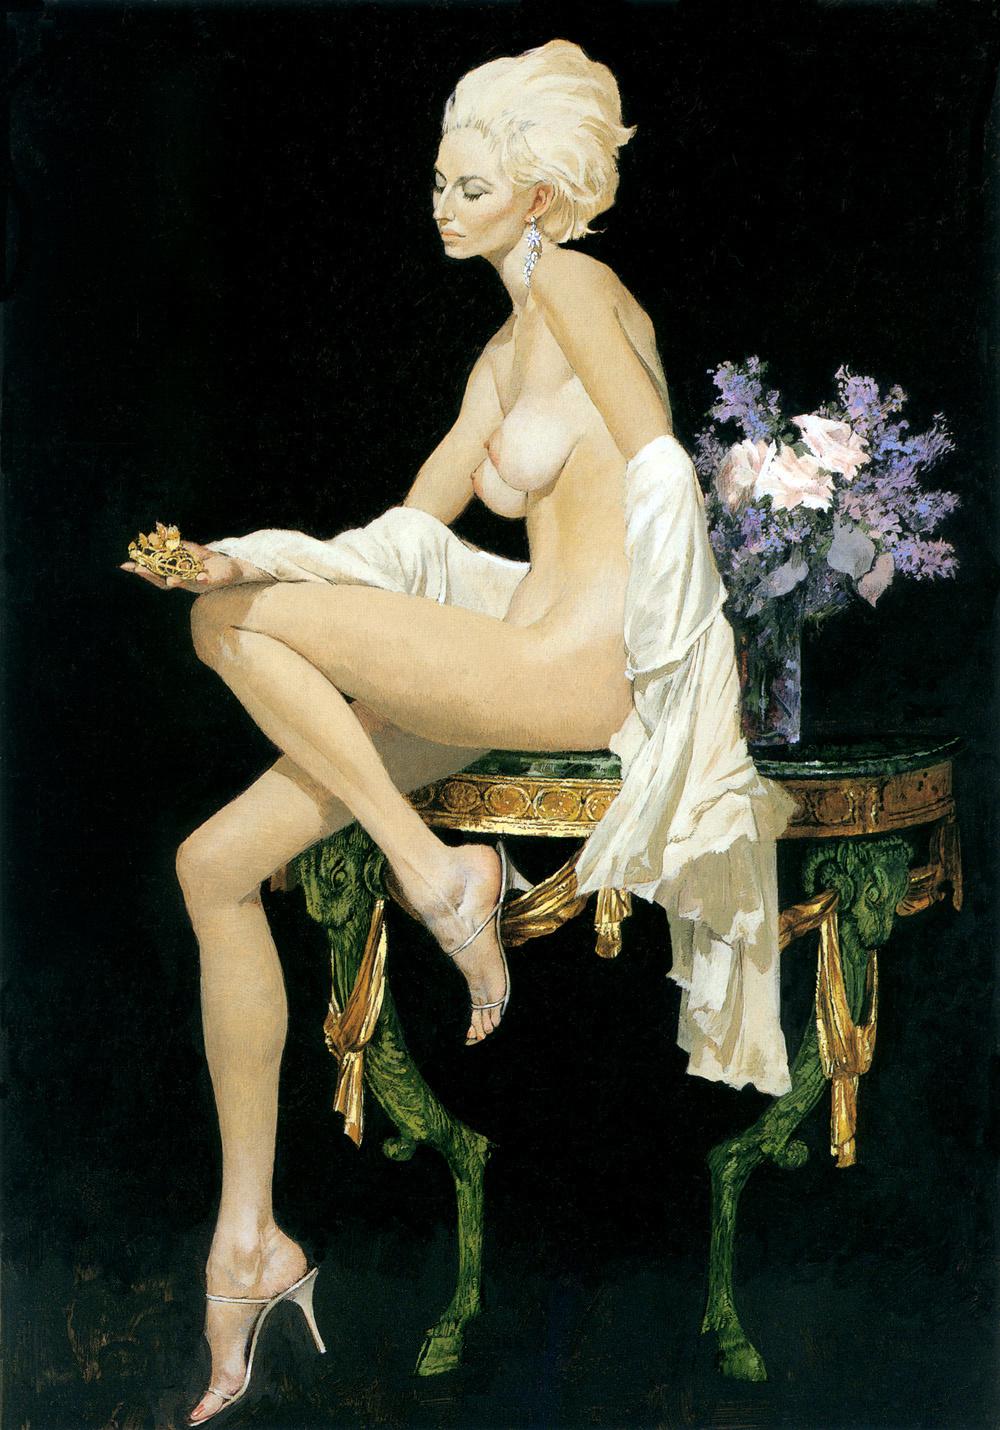 Robert McGinnis. The girl of gold